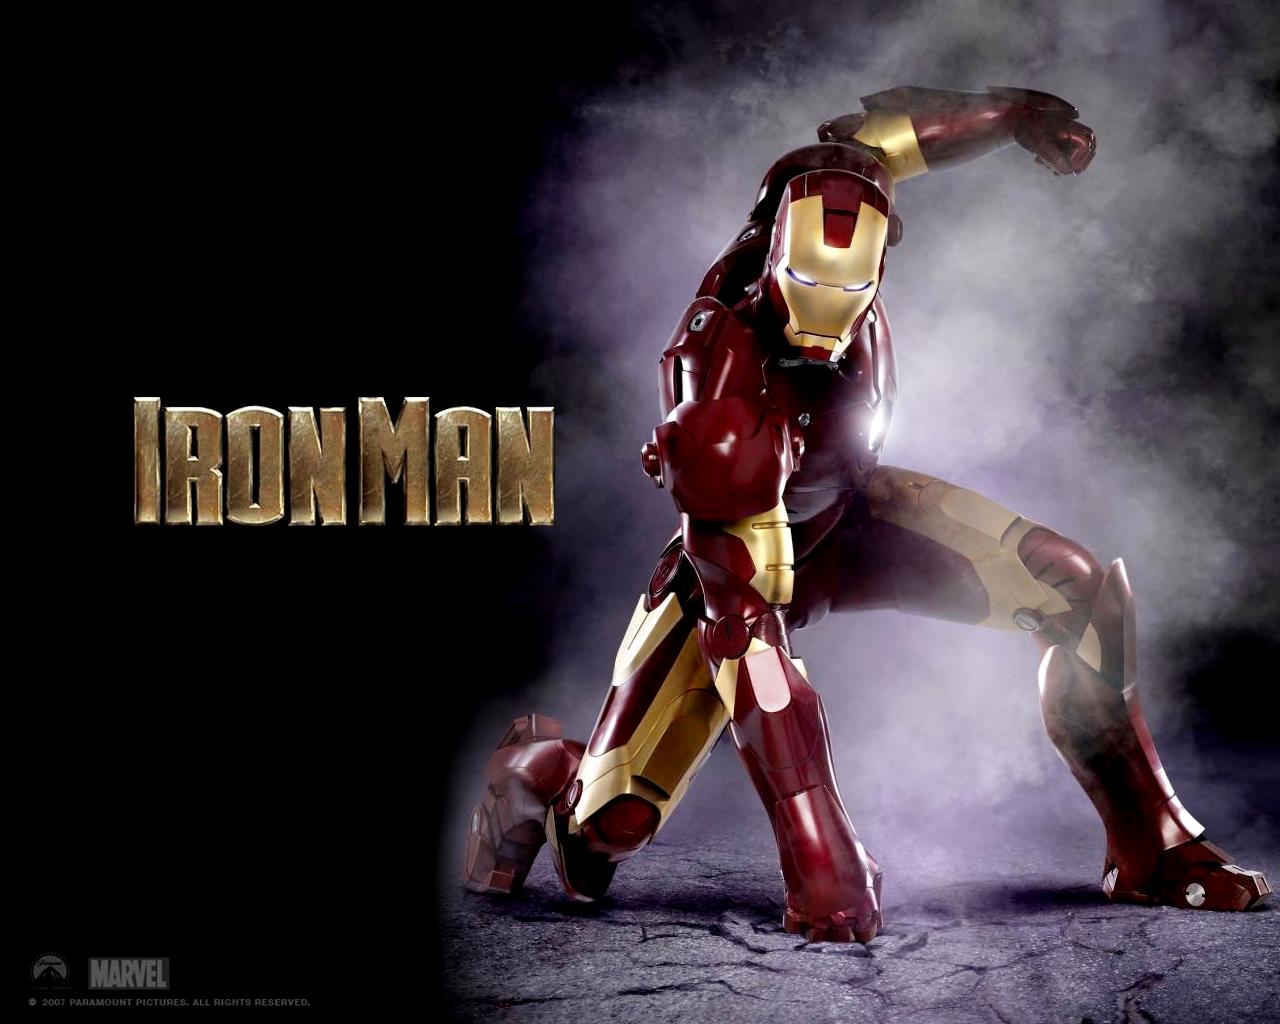 http://1.bp.blogspot.com/-uJ-JP82Gkis/T7VZgOJYsmI/AAAAAAAACds/apz6UhBNDps/s1600/Iron_man_HQ_Posters1.jpg